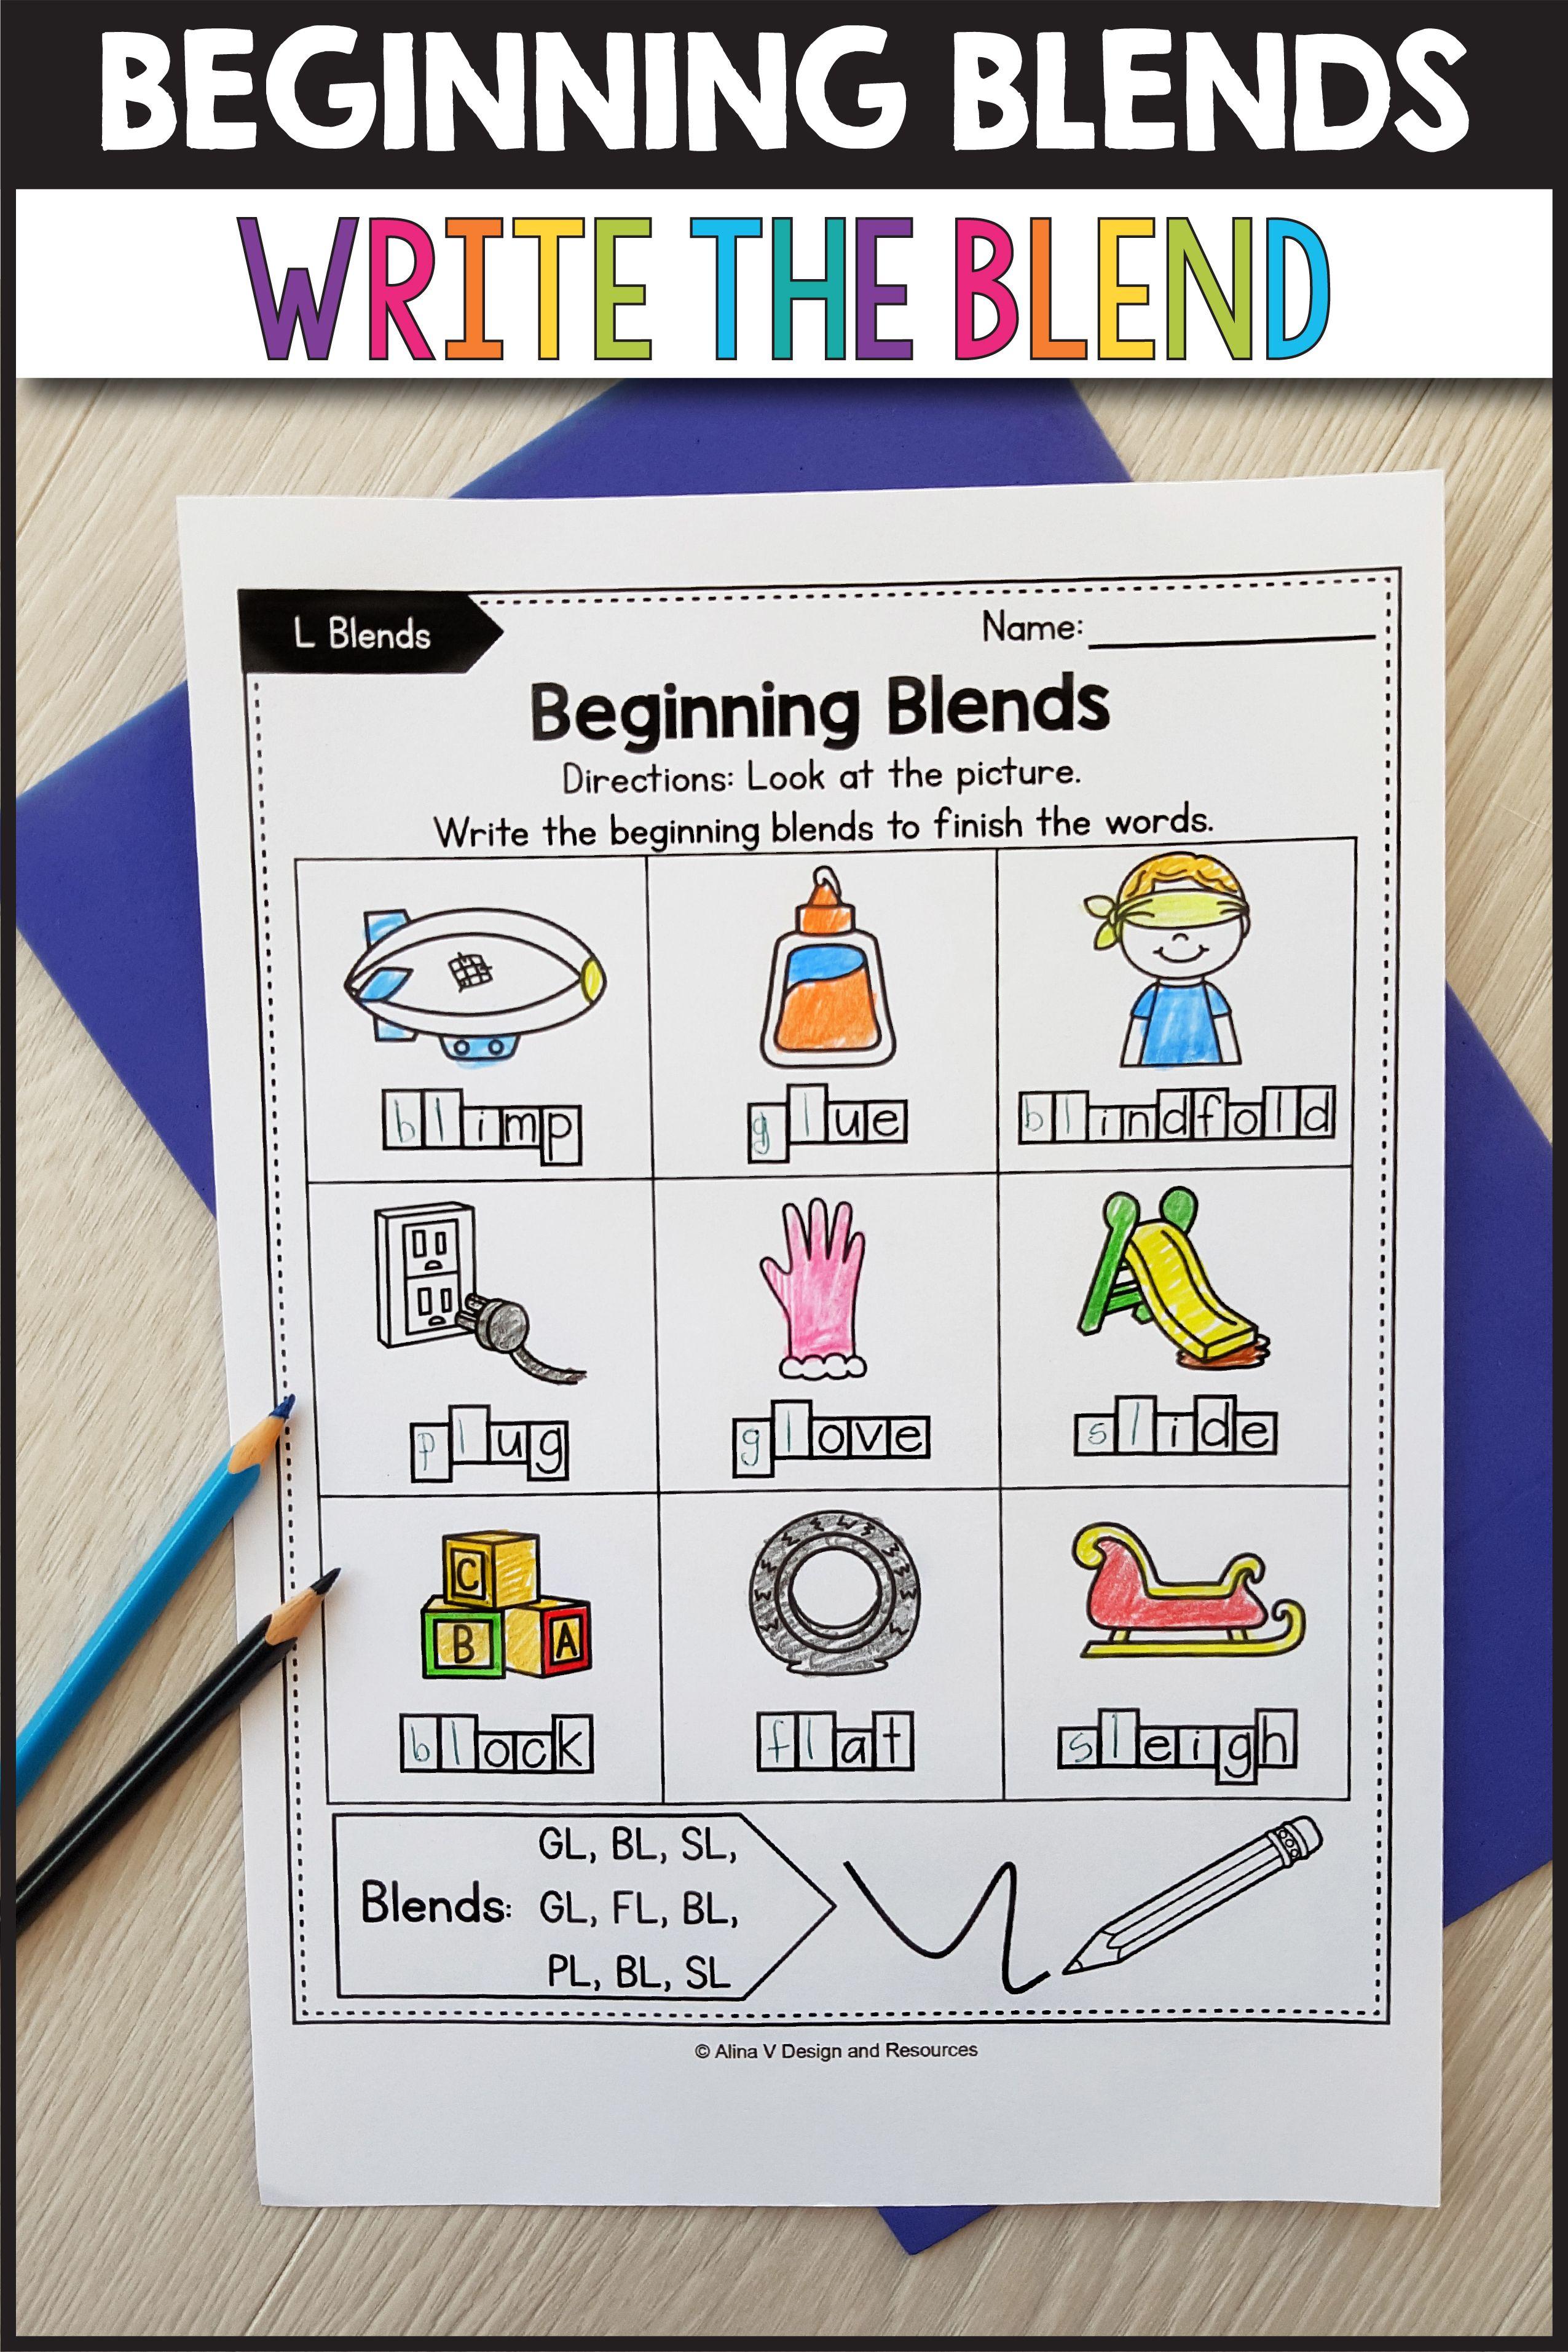 R Blends Worksheets L Blends Activities